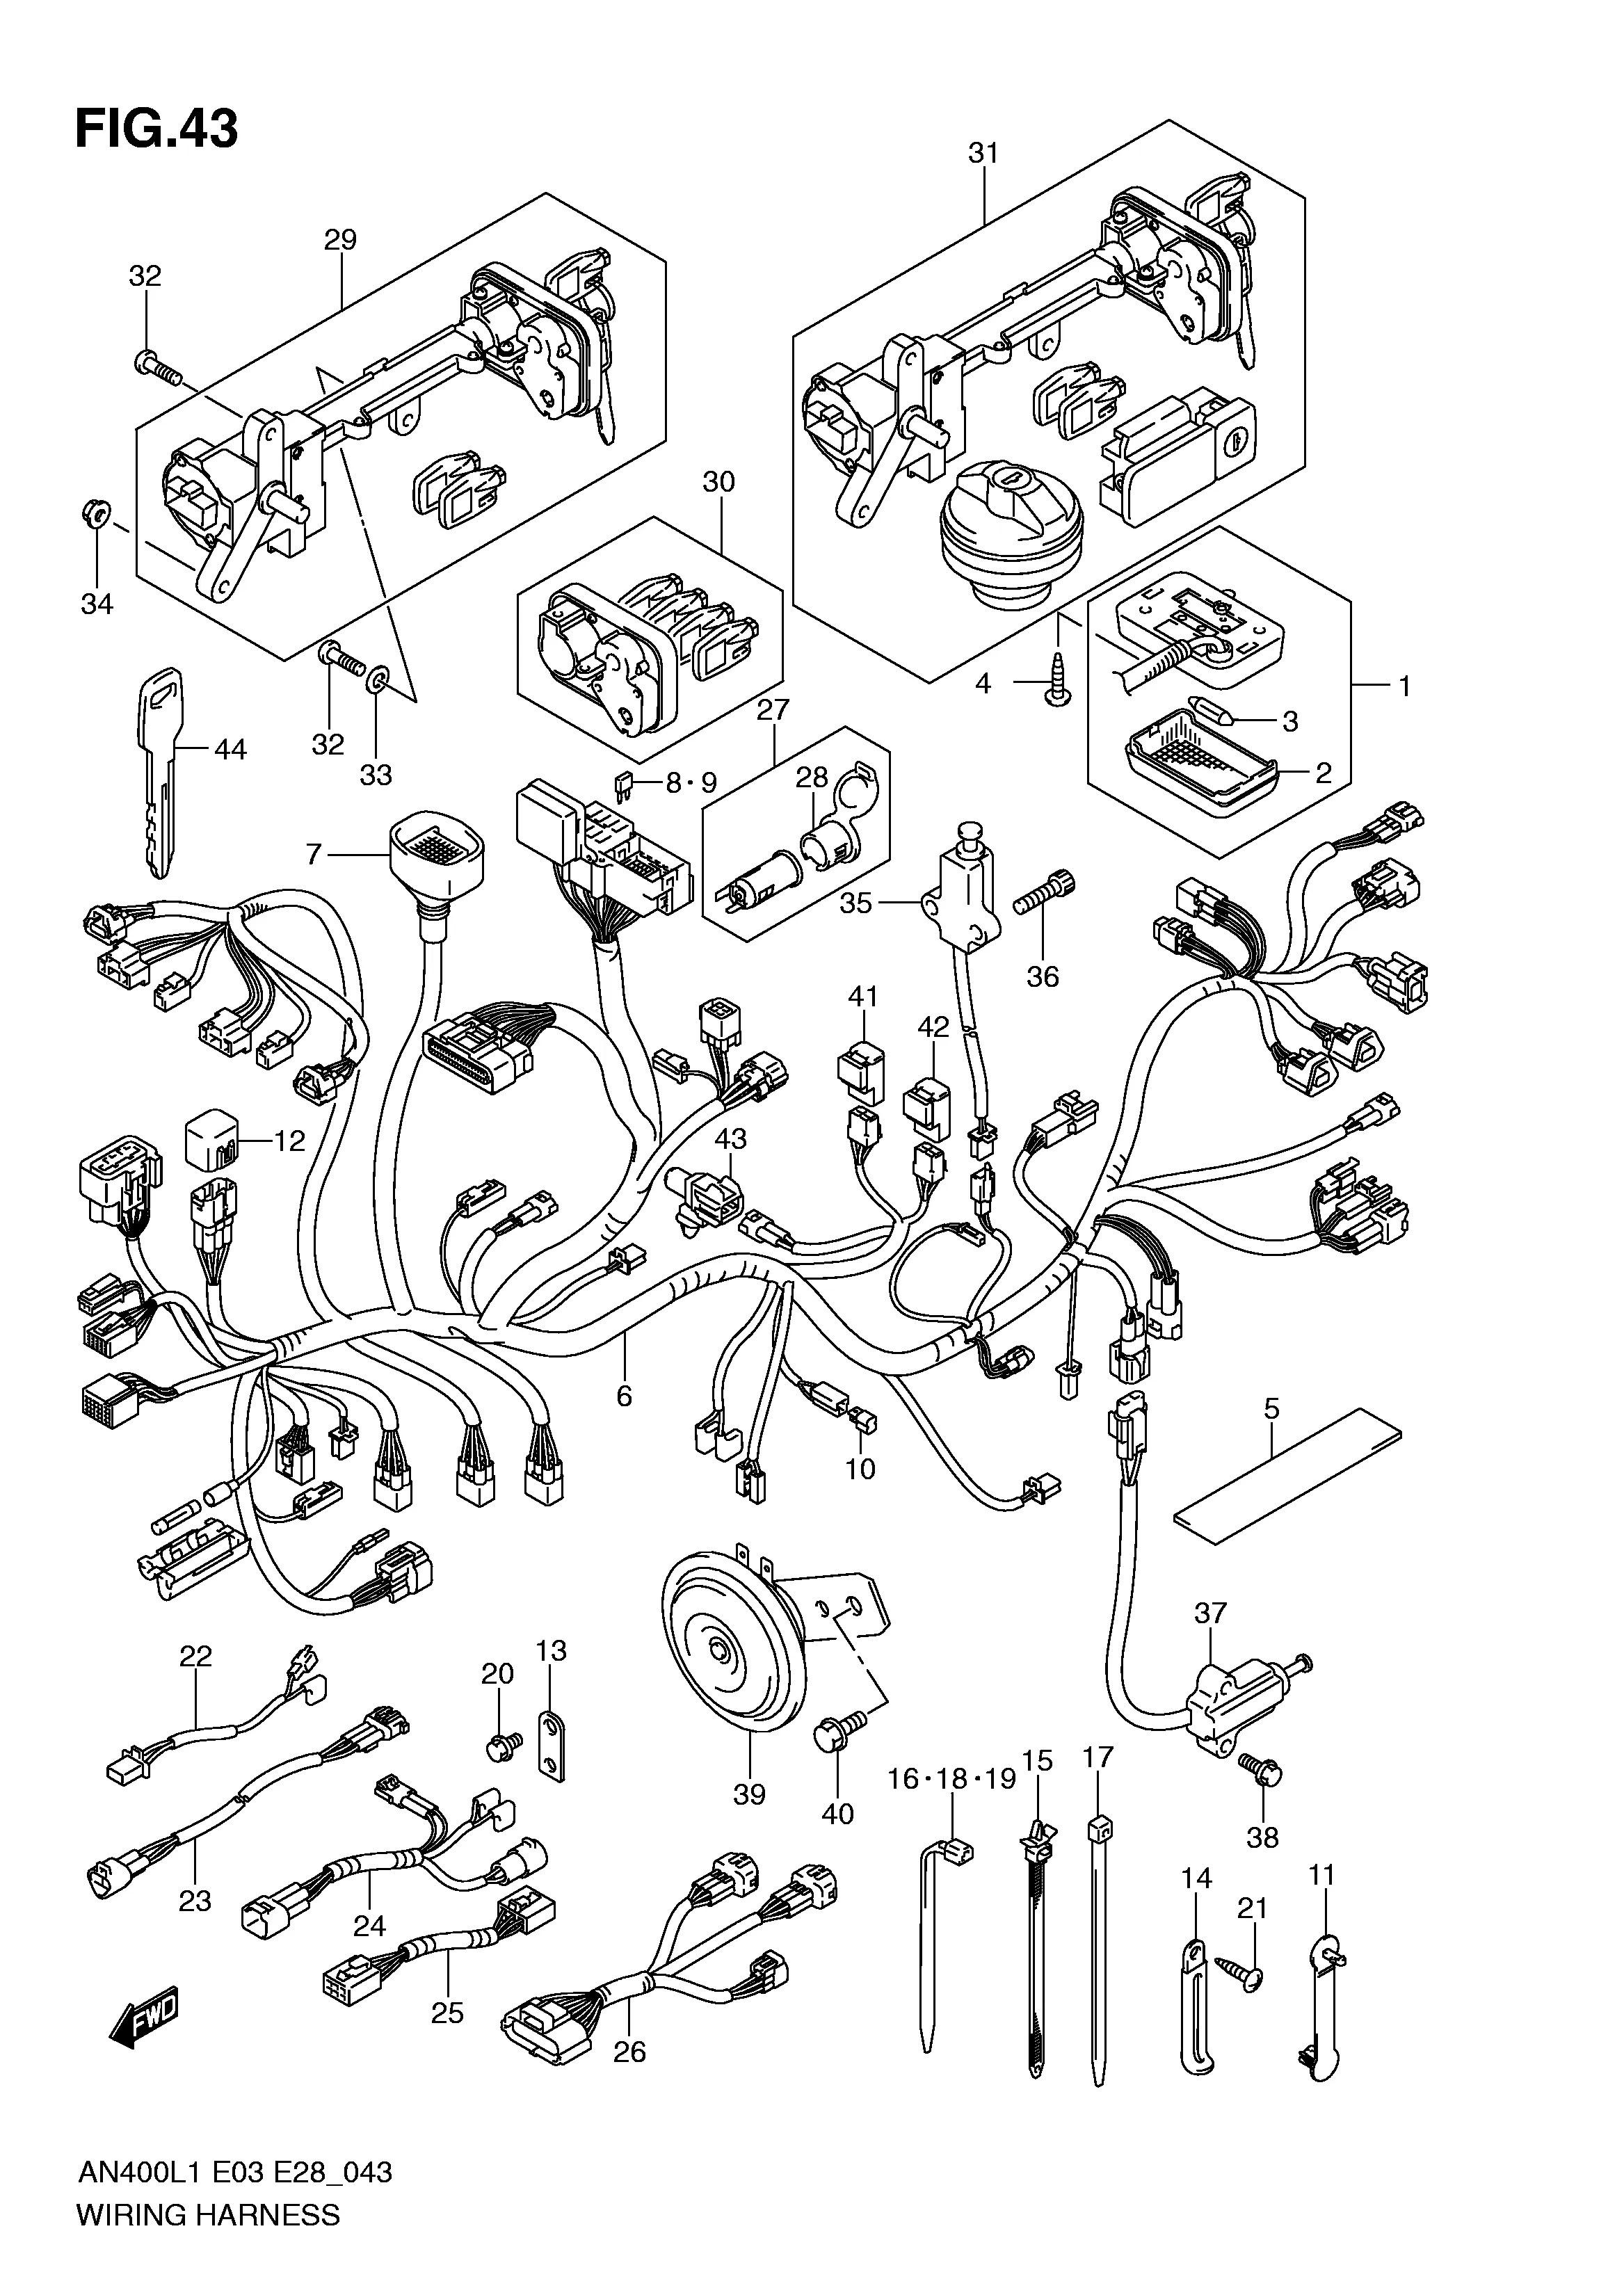 Sistema electrico completo abs Suzuki Burgman 400 2007-2013